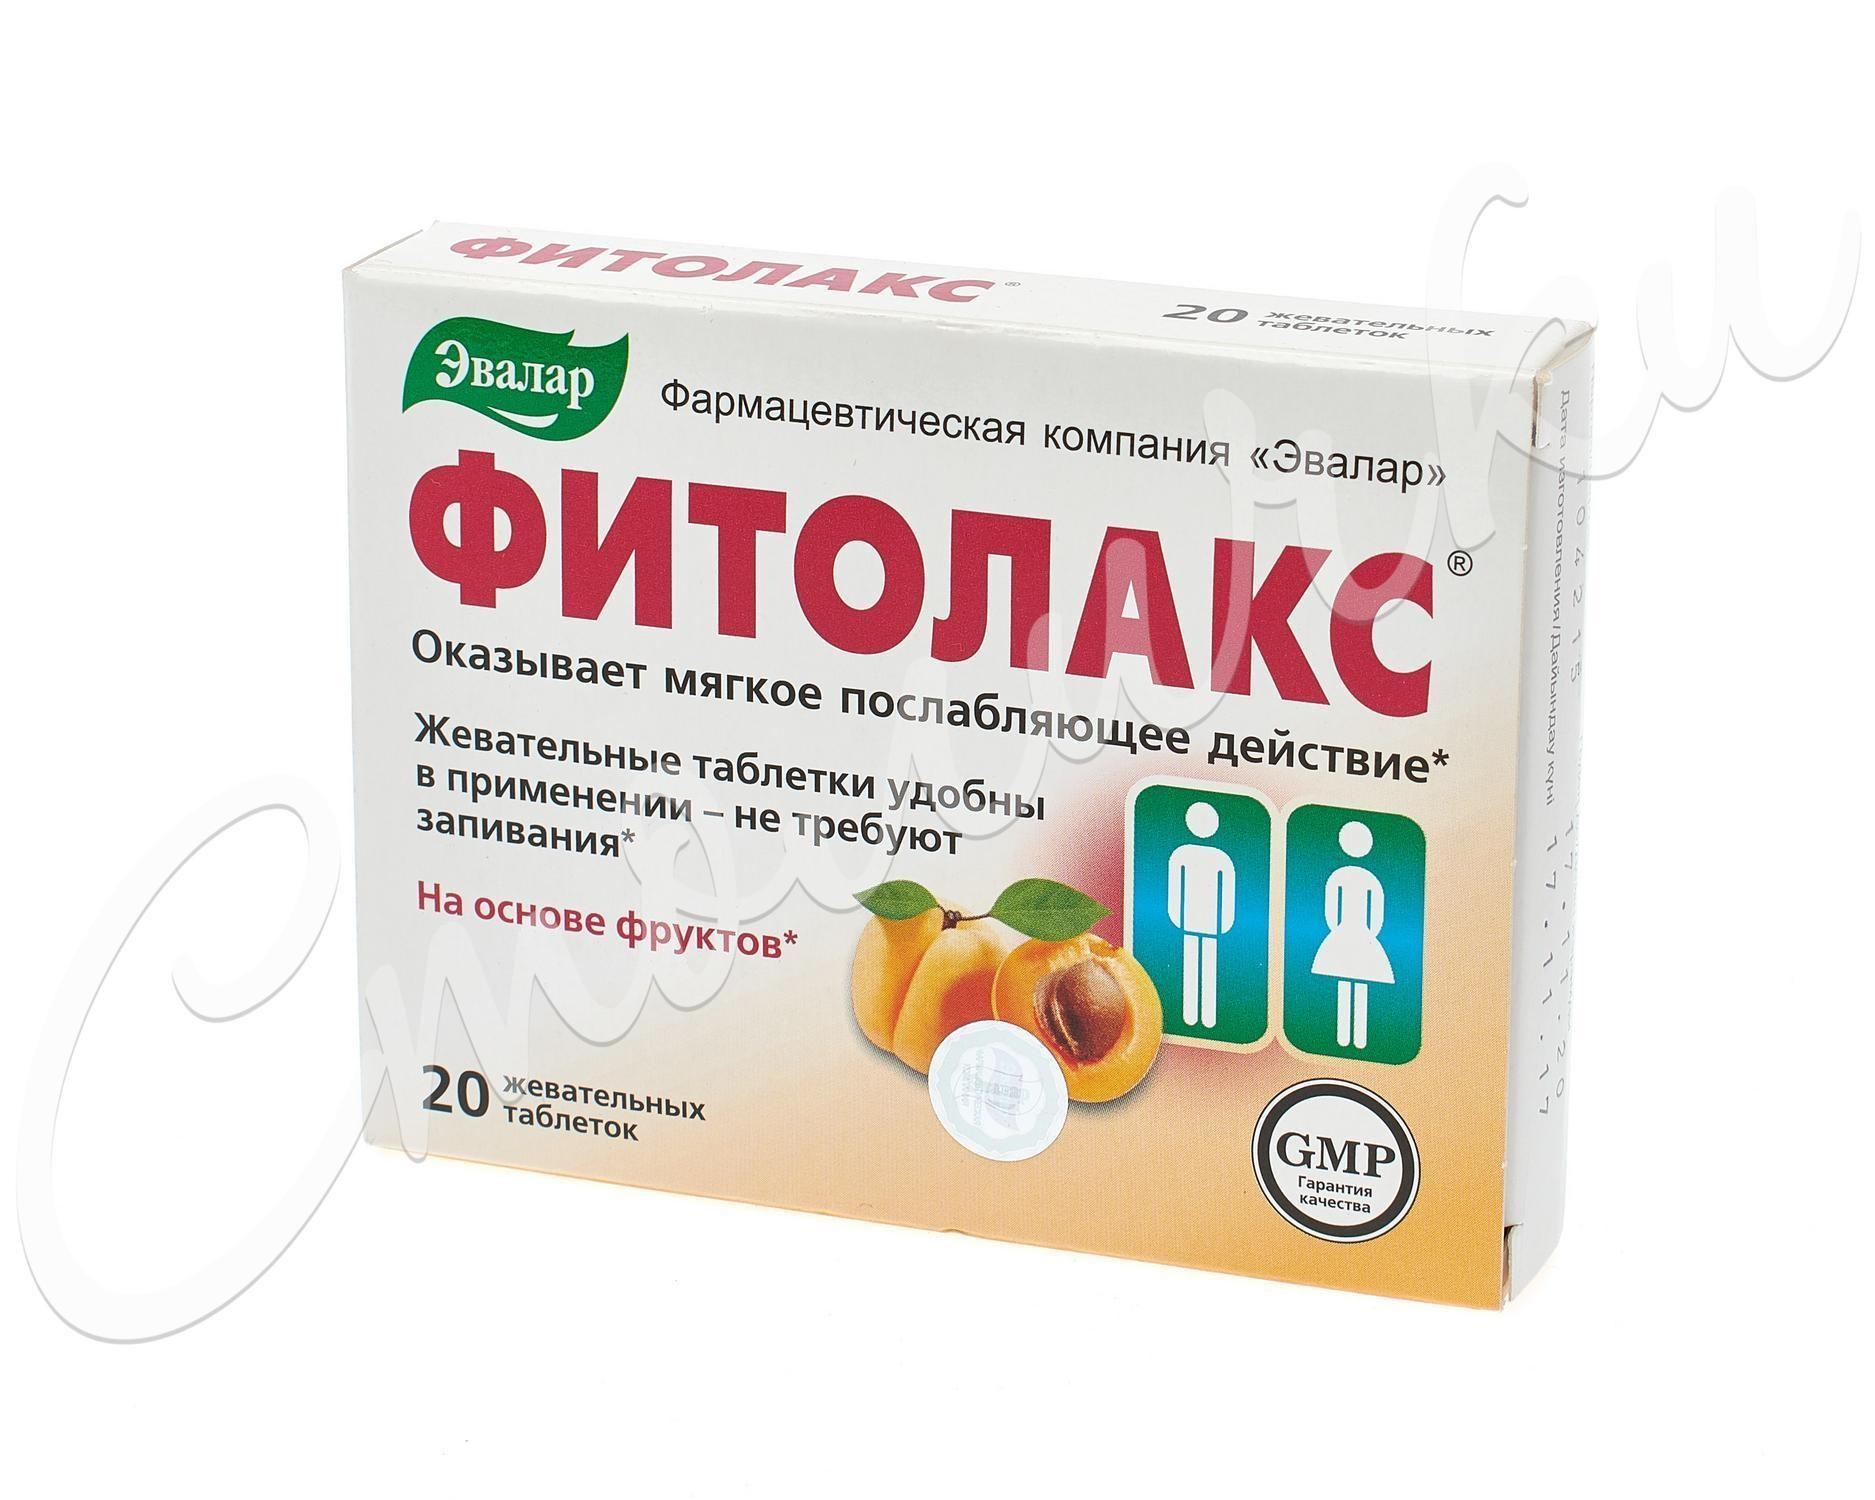 Фитобаланс (fitobalance)— отзывы